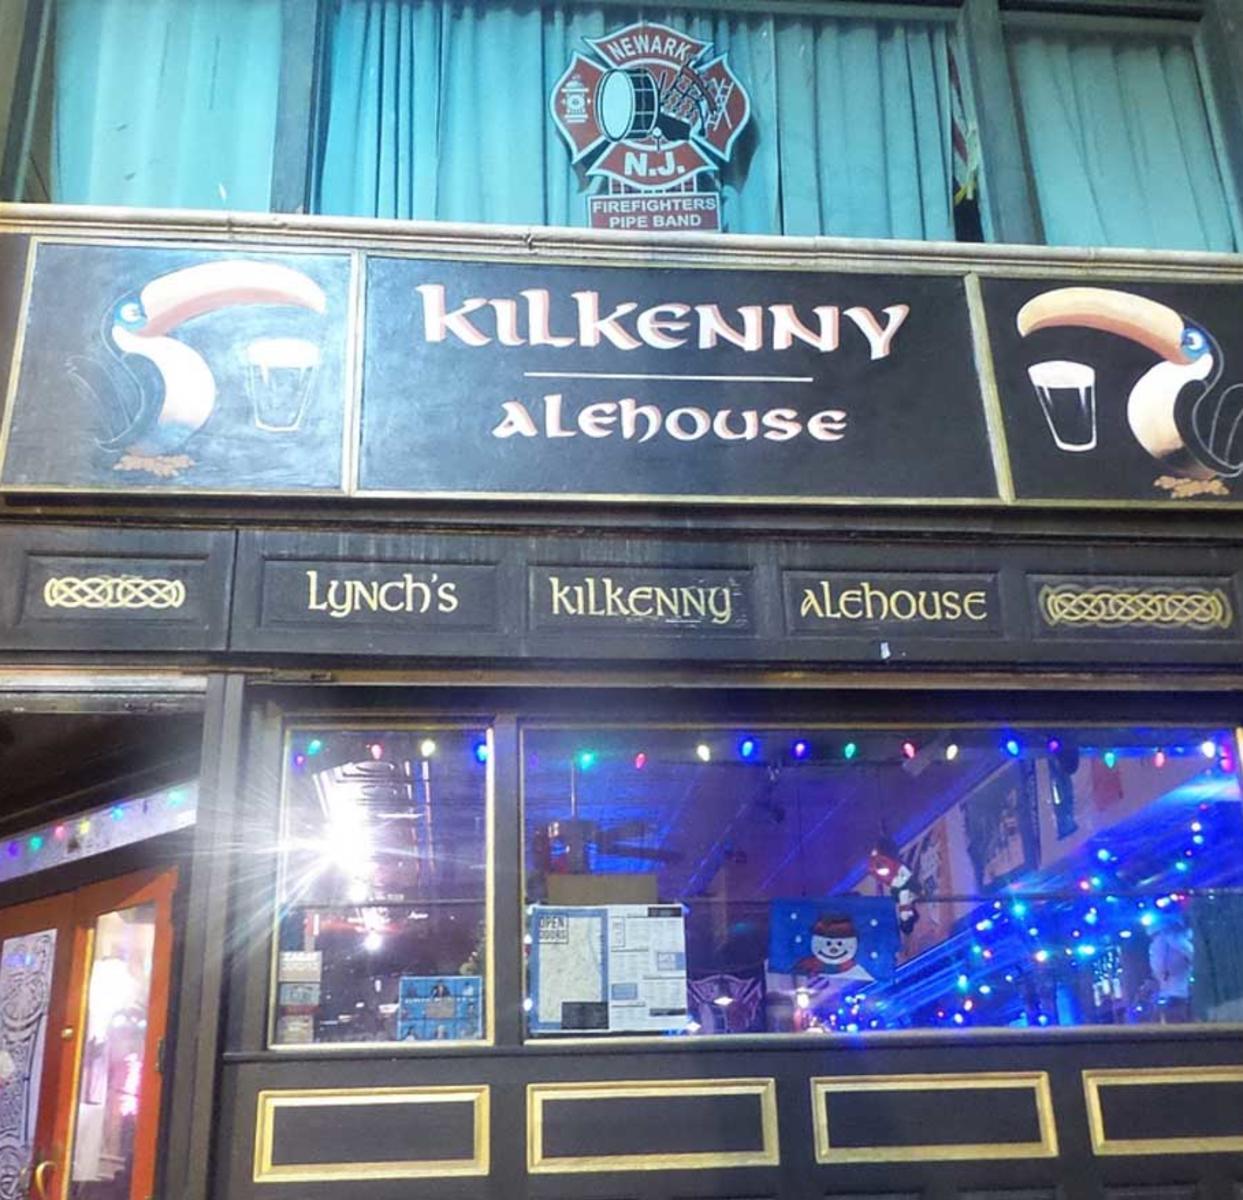 Kilkenny exterior